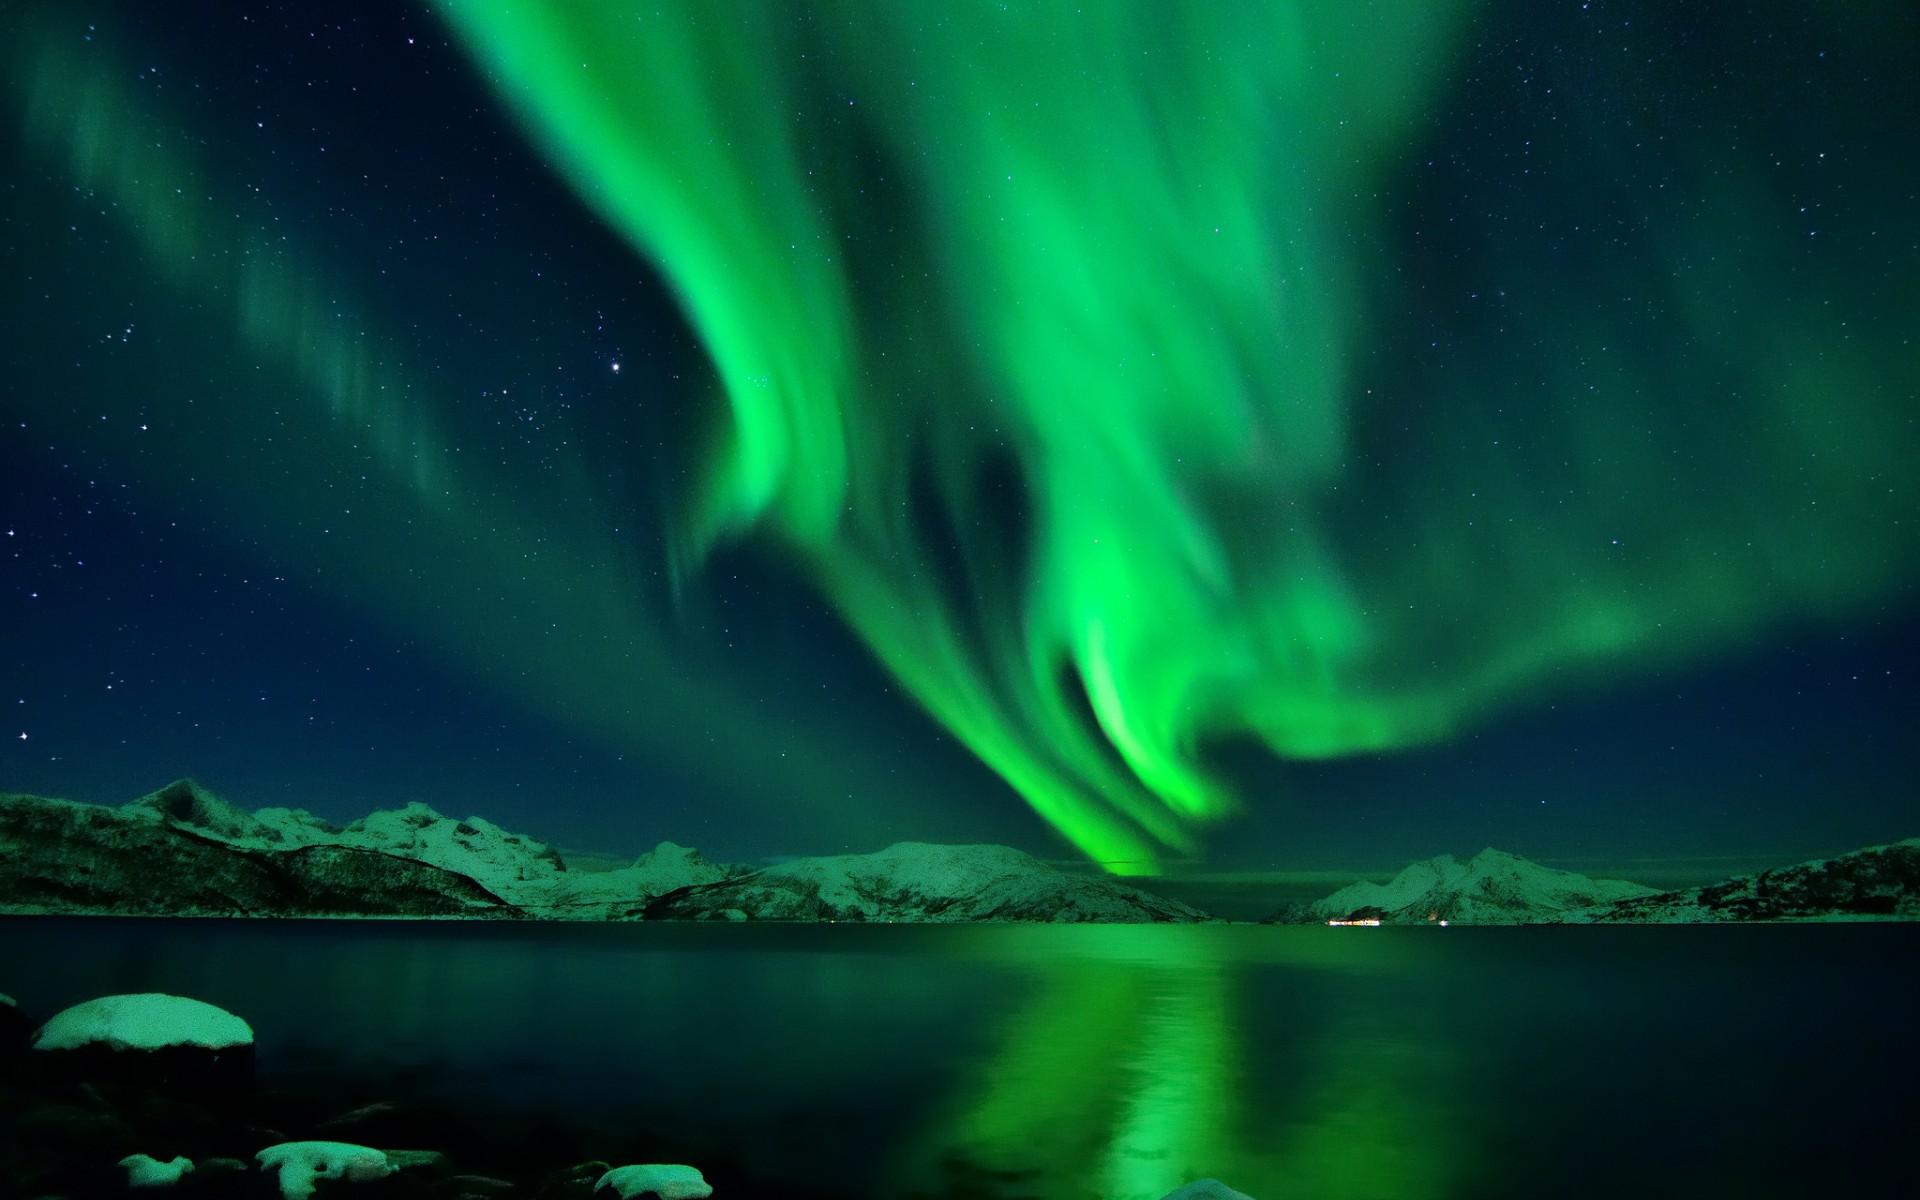 Desktop Wallpaper 189 – Aurora boreale